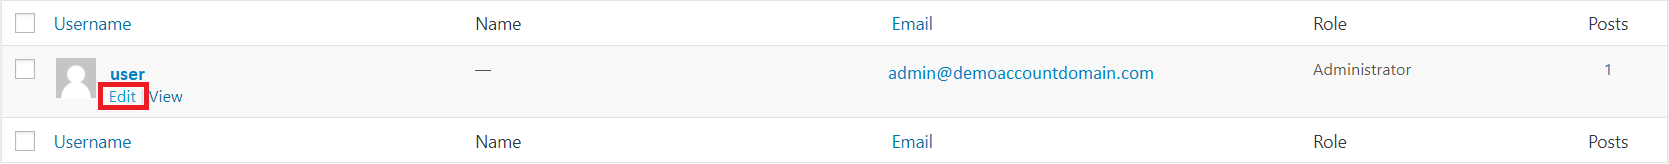 edit_user_password.png